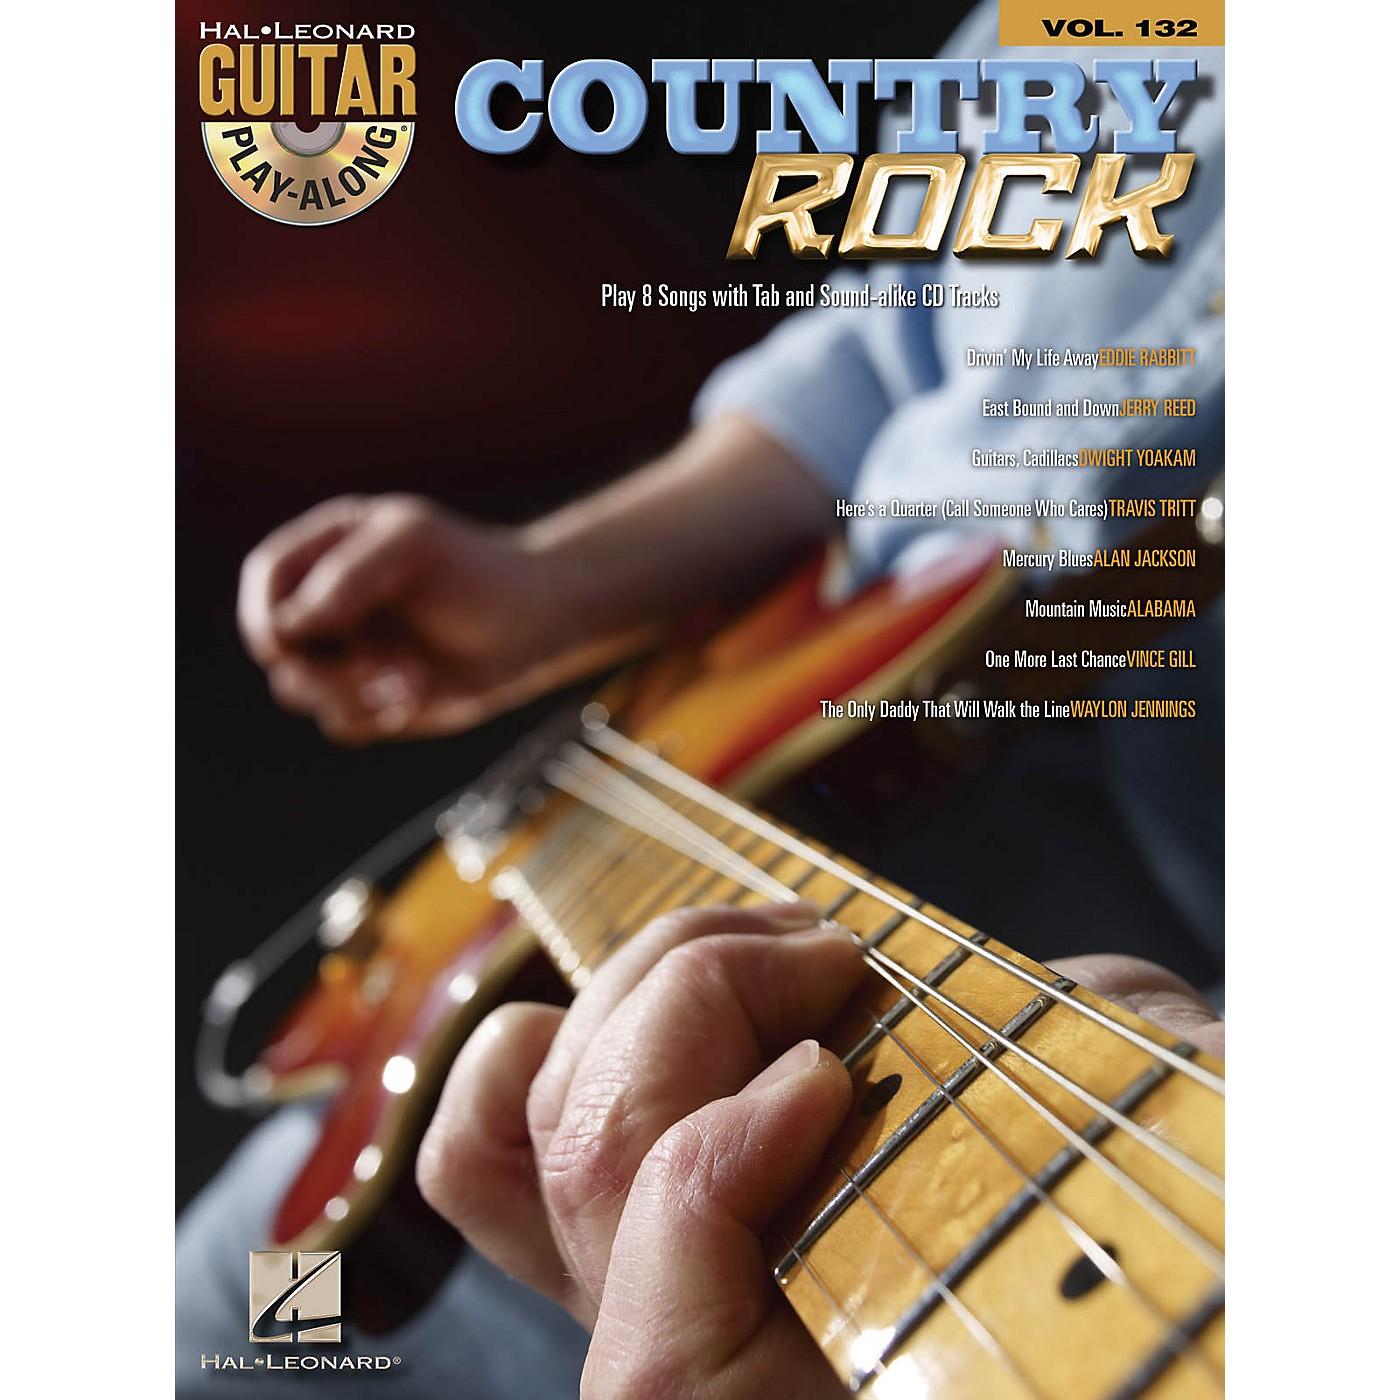 Hal Leonard Country Rock - Guitar Play-Along Volume 132 Book/CD thumbnail